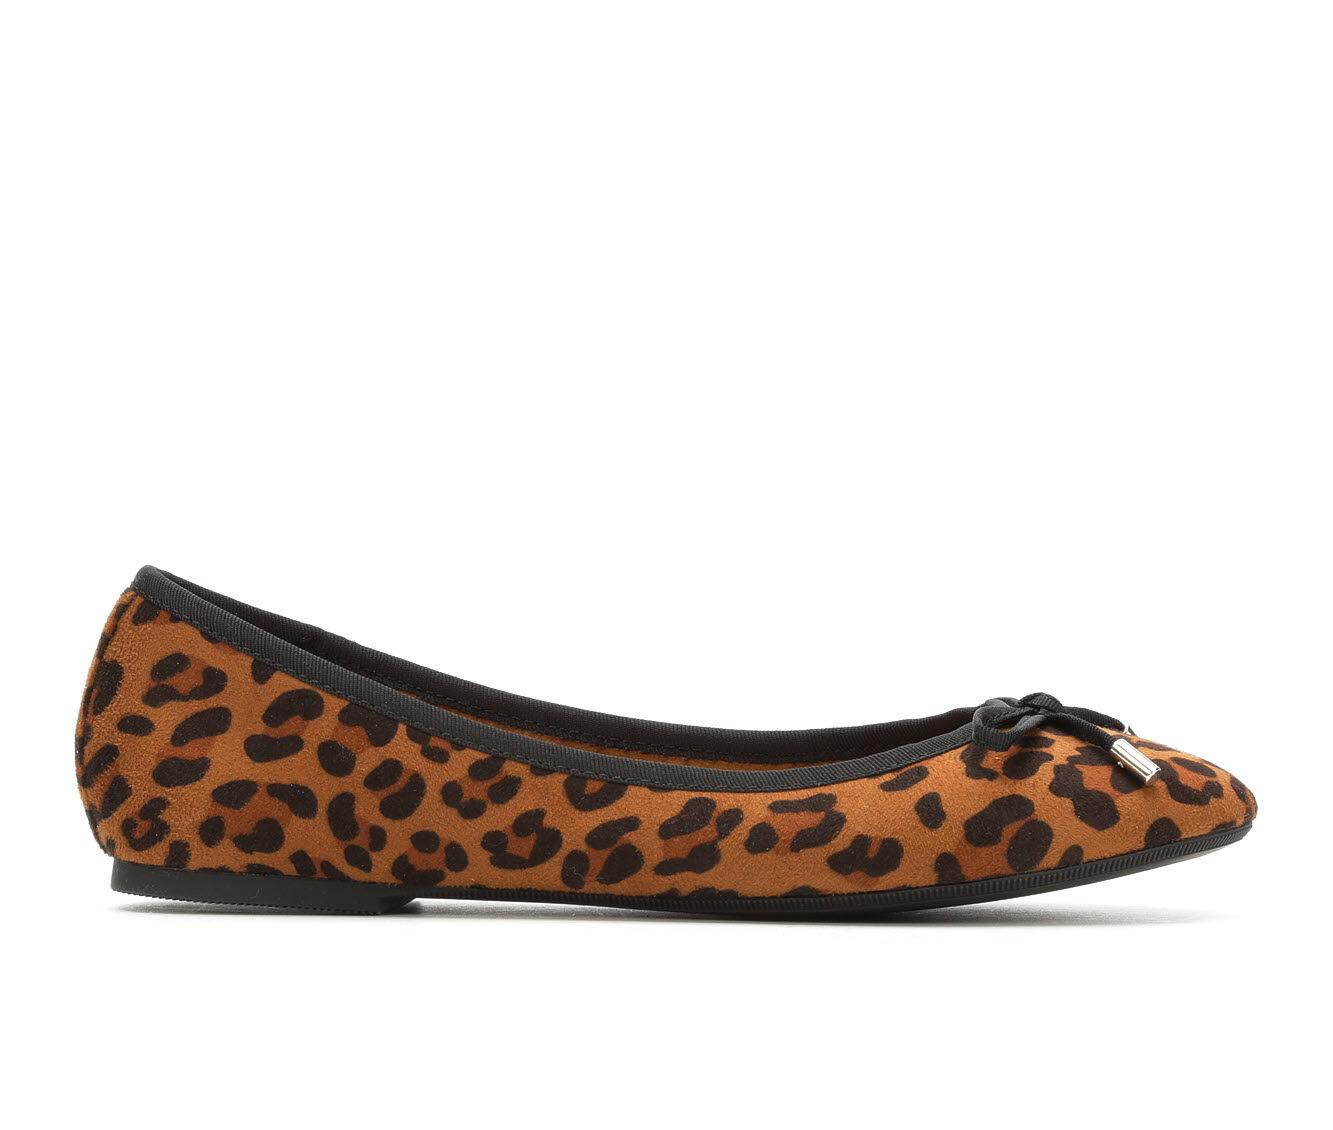 Women's No Parking Larsah Flats Leopard